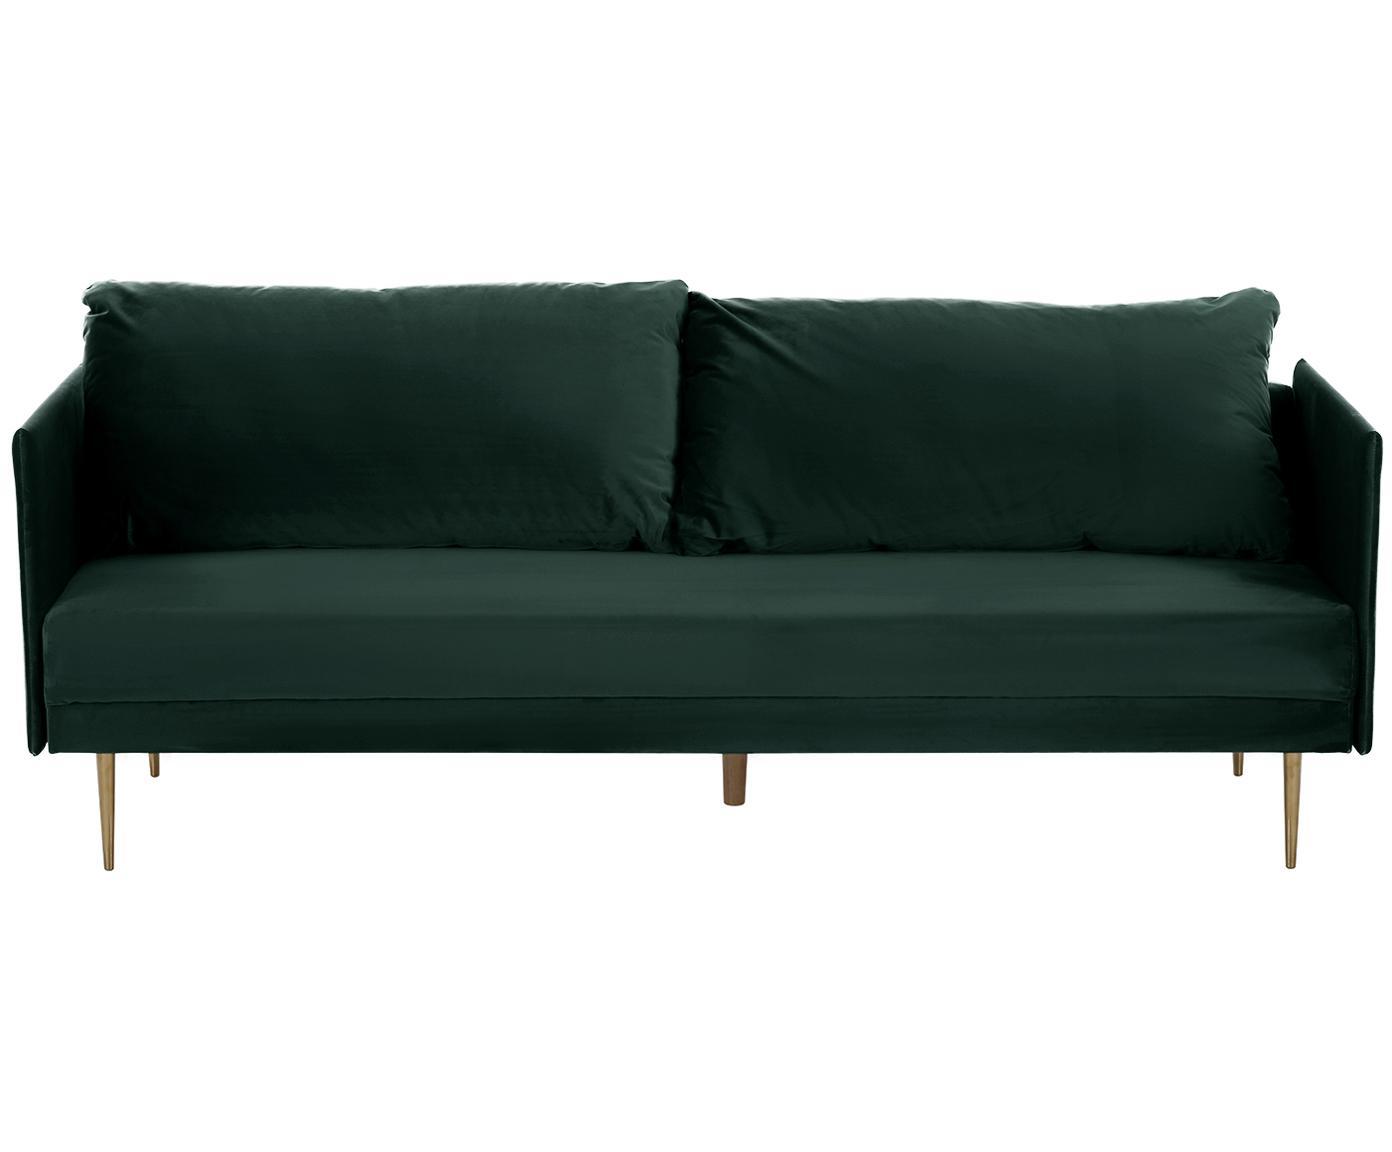 Samt-Schlafsofa Lauren, Bezug: Samt (Polyester) 28.000 S, Gestell: Kiefernholz, Samt Dunkelgrün, 206 x 87 cm